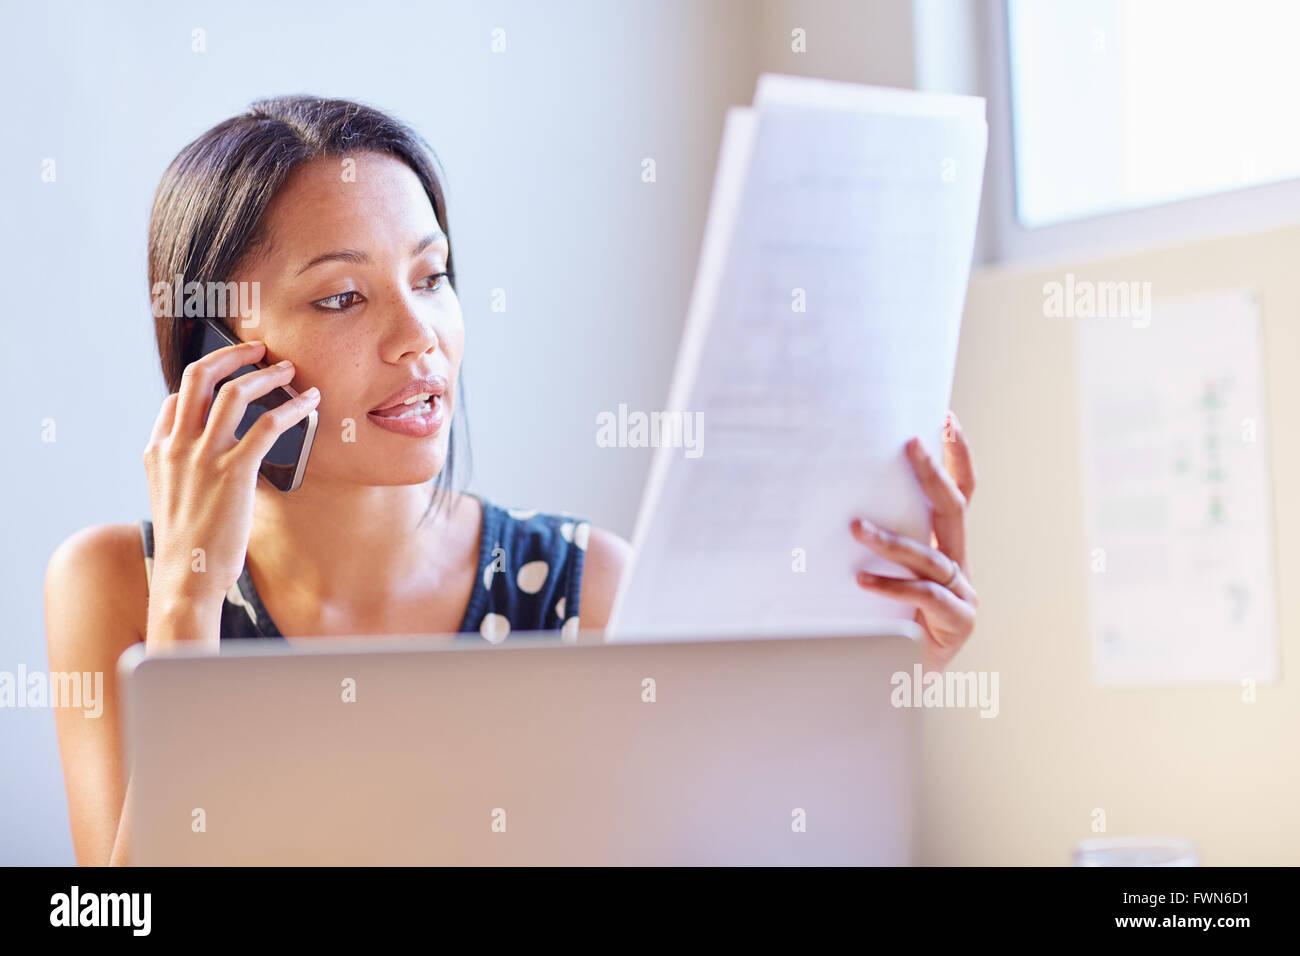 Asegurar sus documentos están en orden Imagen De Stock